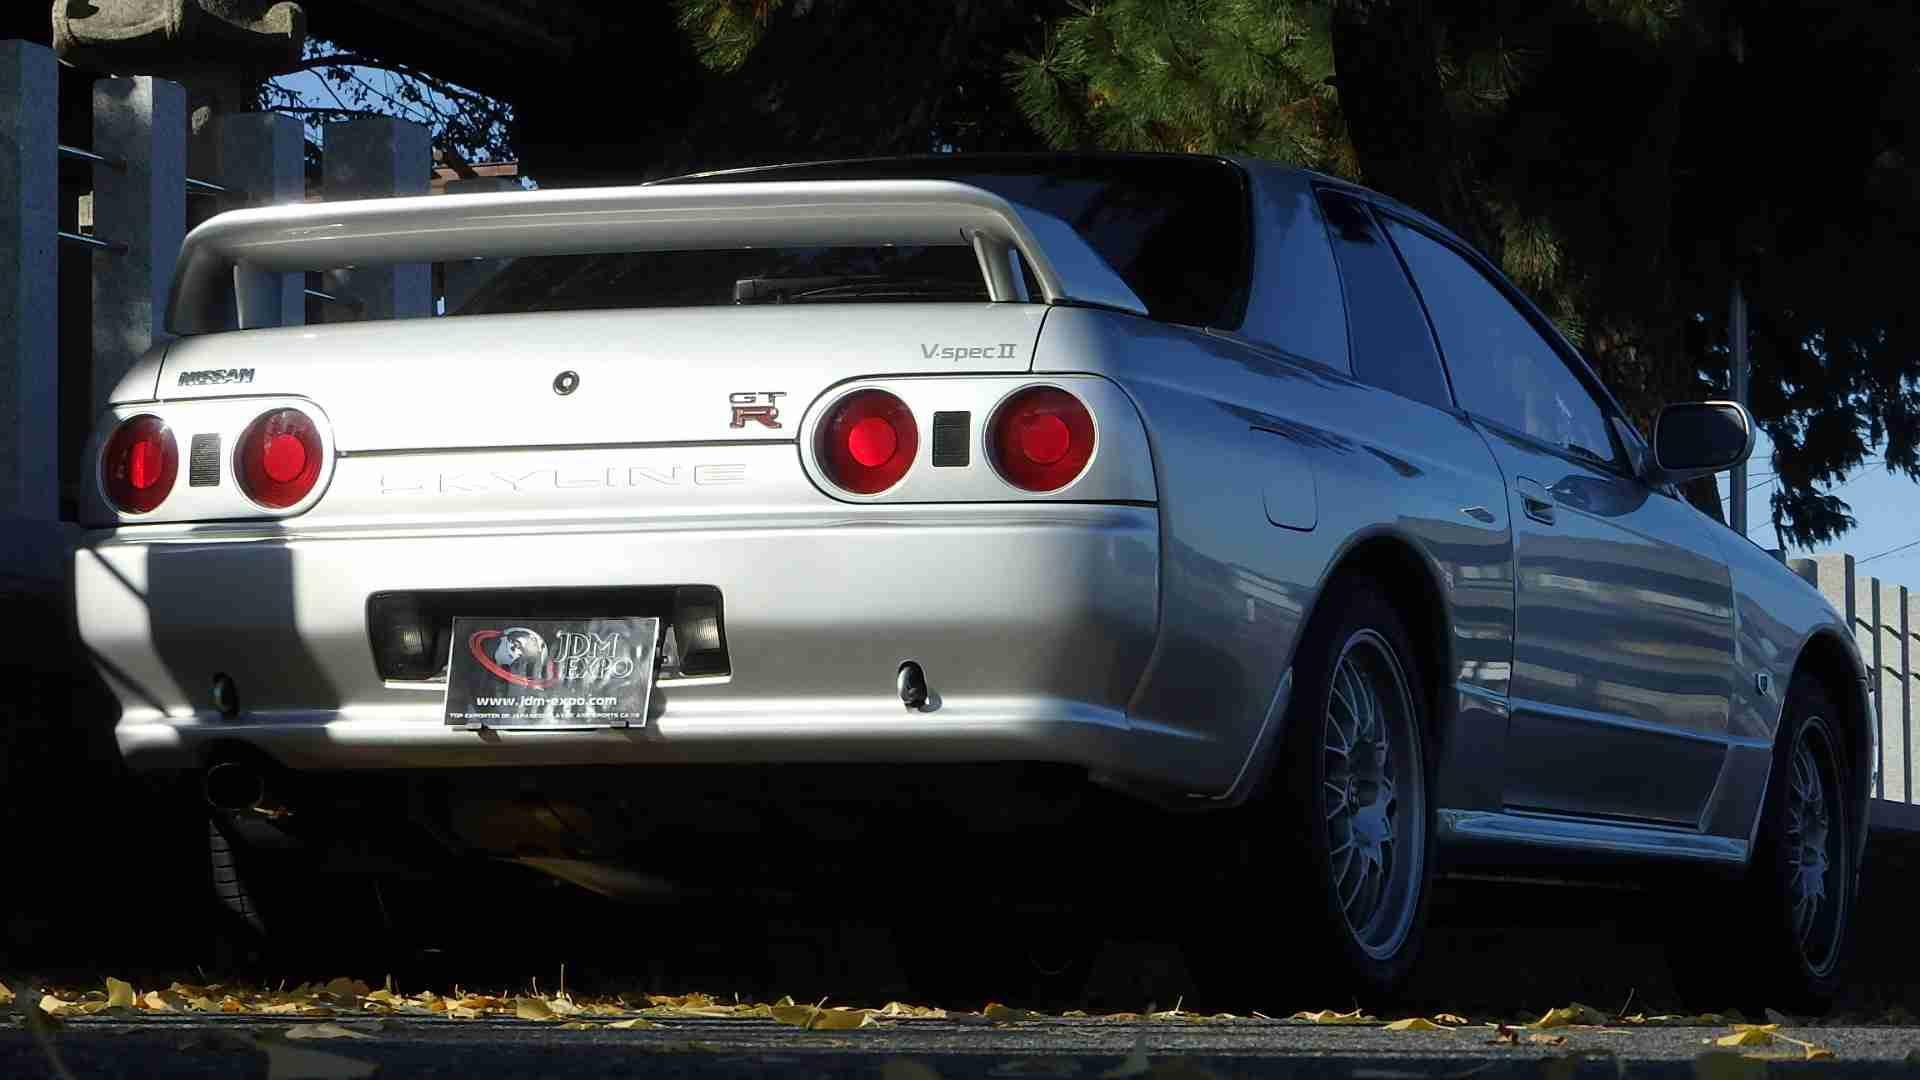 Nissan Skyline Gtr V Spec Ii For Sale At Jdm Expo